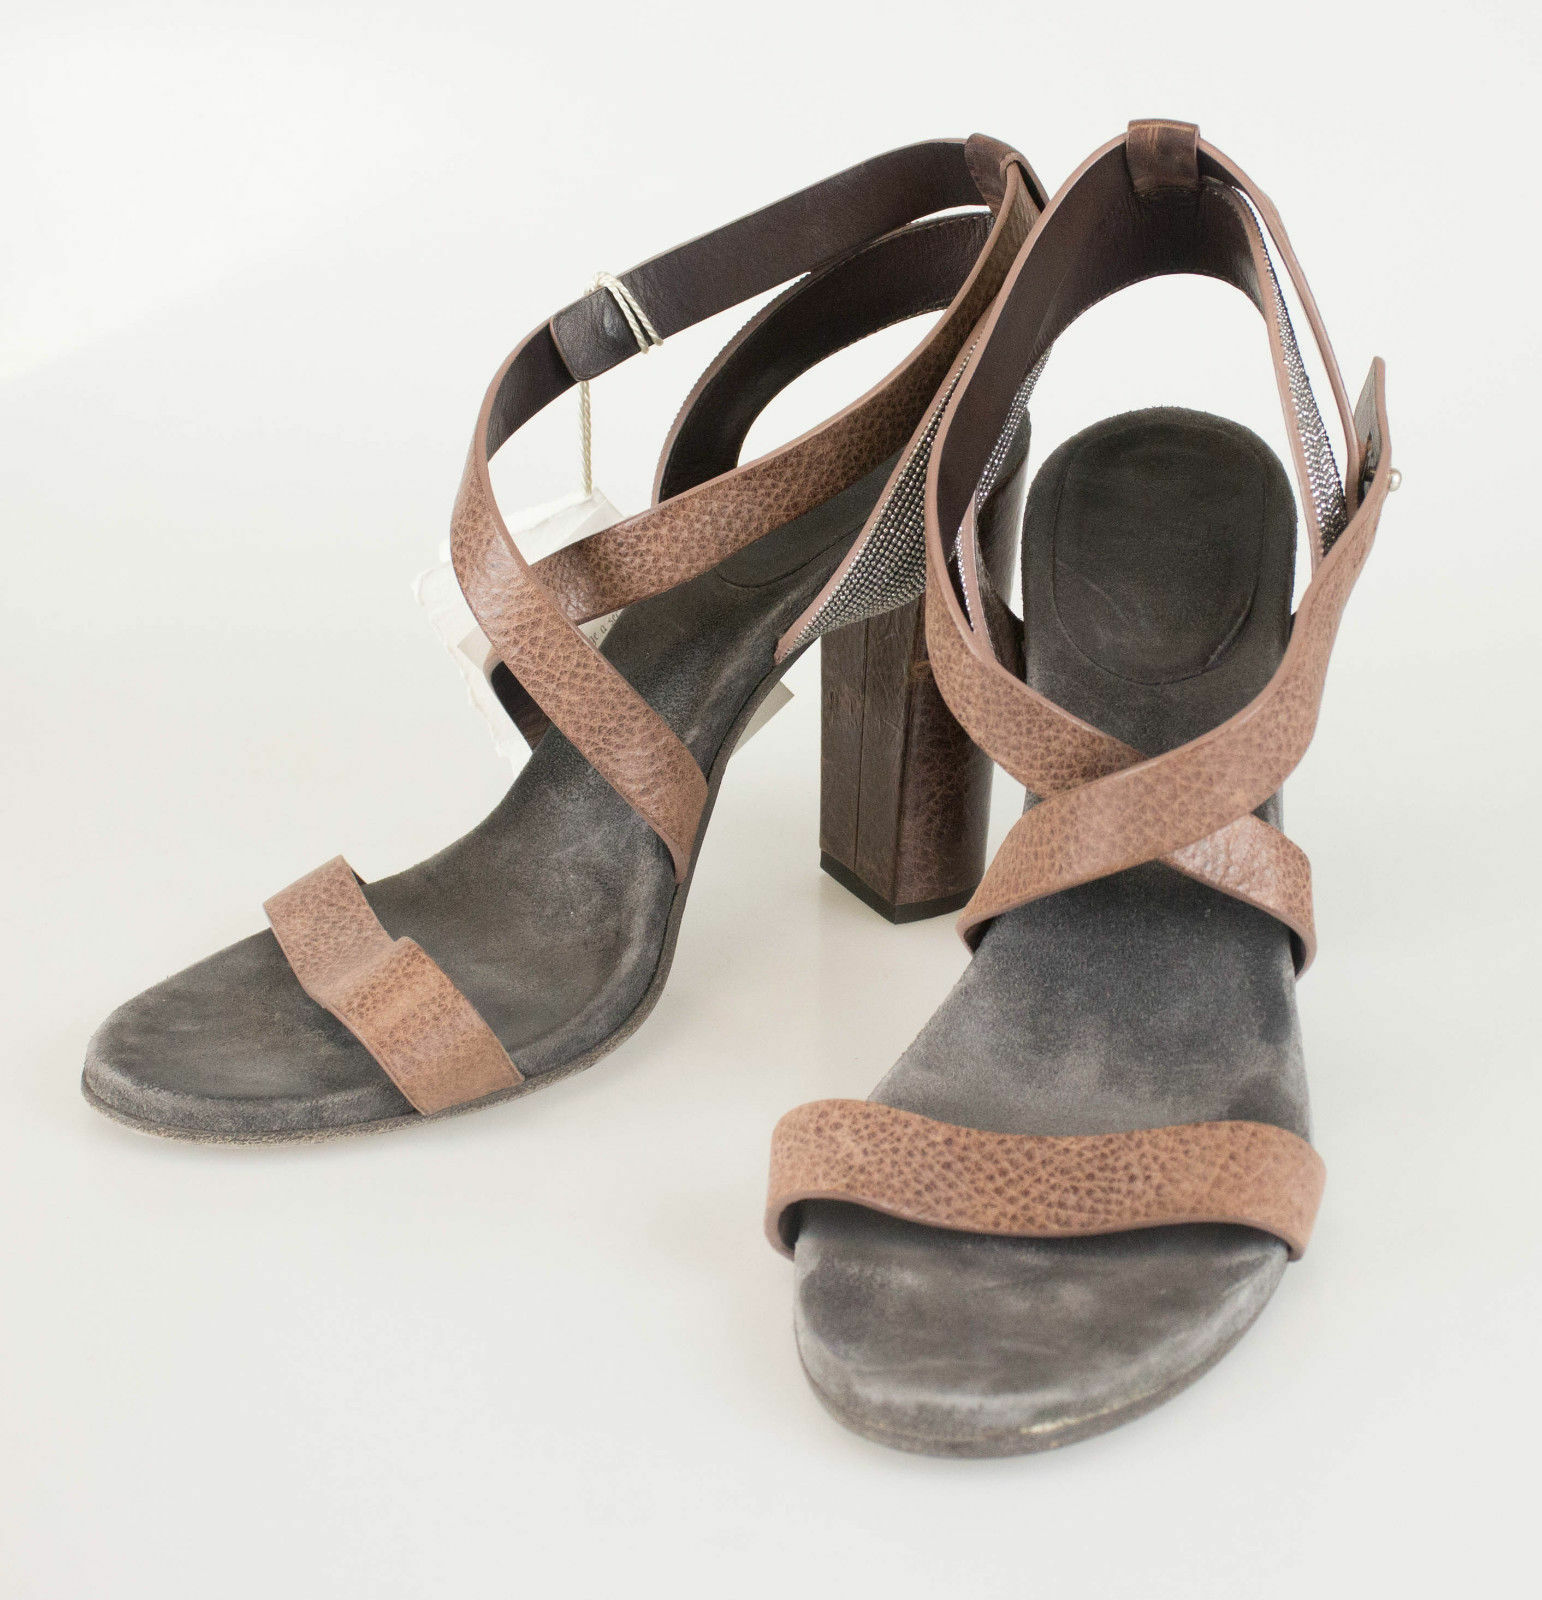 BRUNELLO CUCINELLI braun Leather Open Toe Strappy Heels schuhe schuhe schuhe 10 40  1330 94eea7